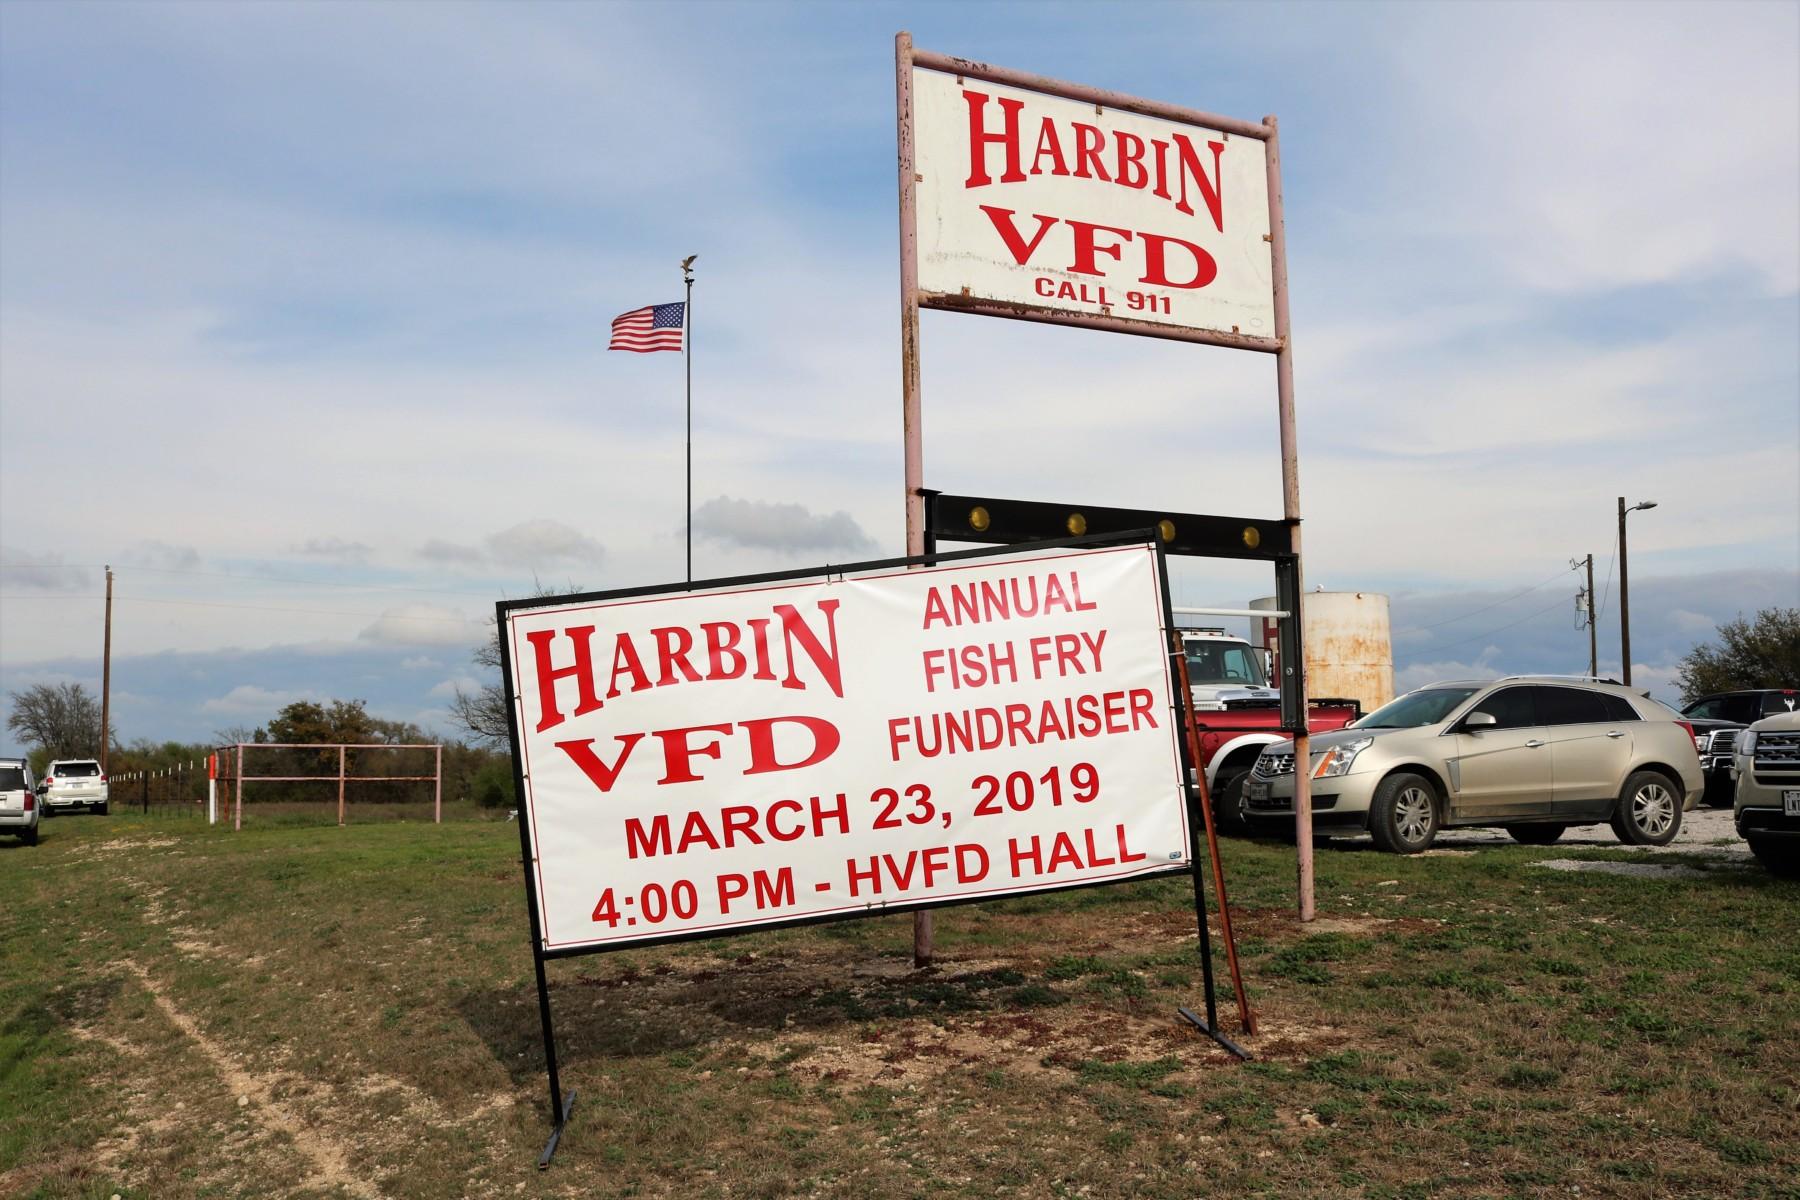 Harbin VFD Fish Fry 1